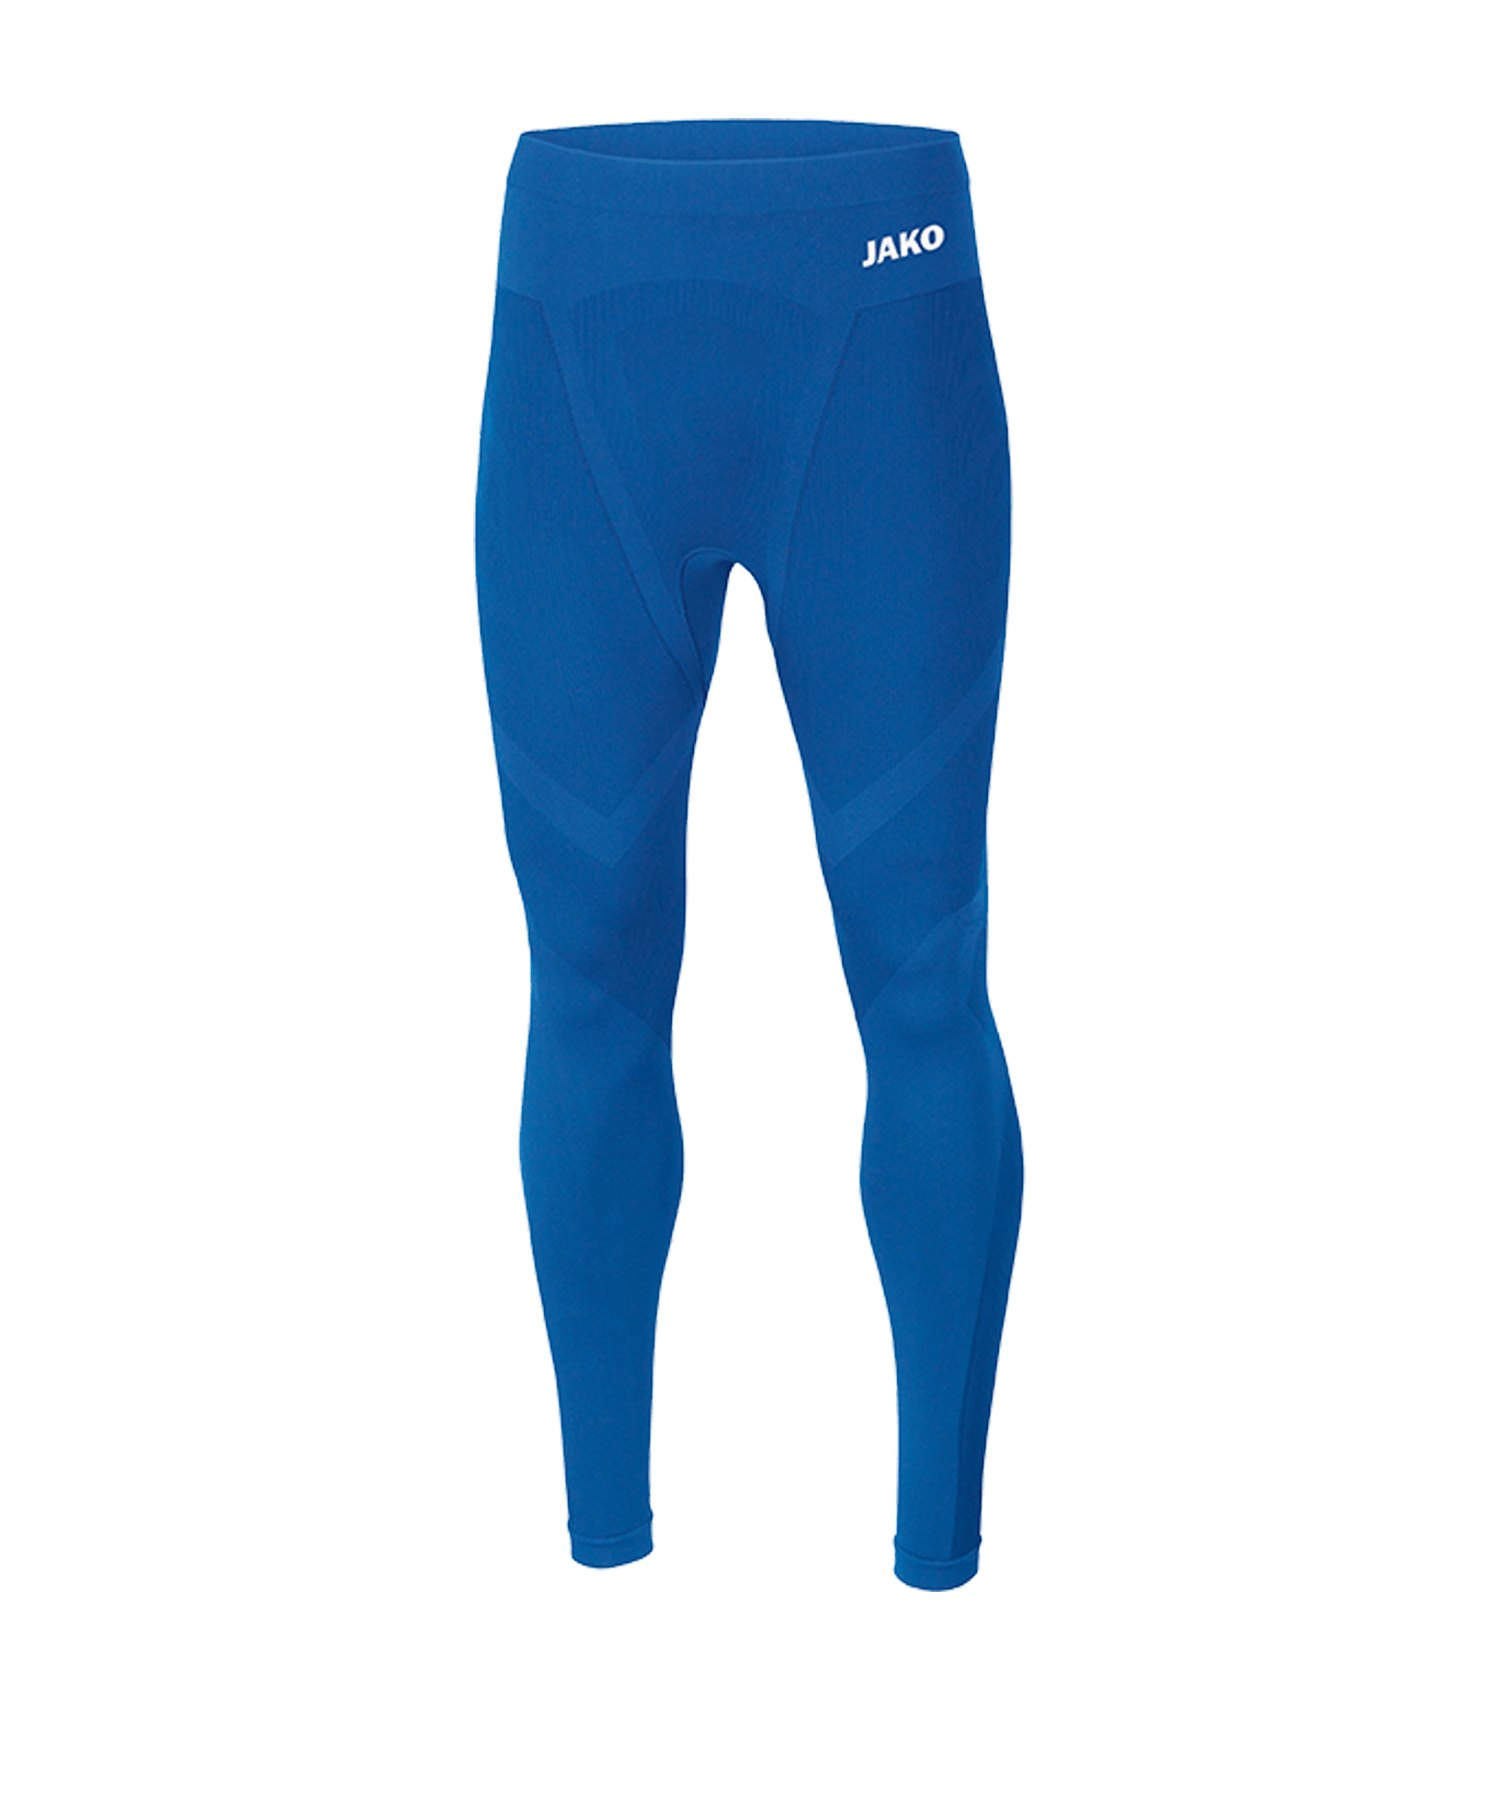 JAKO Comfort 2.0 Long Tight Blau F04 - blau